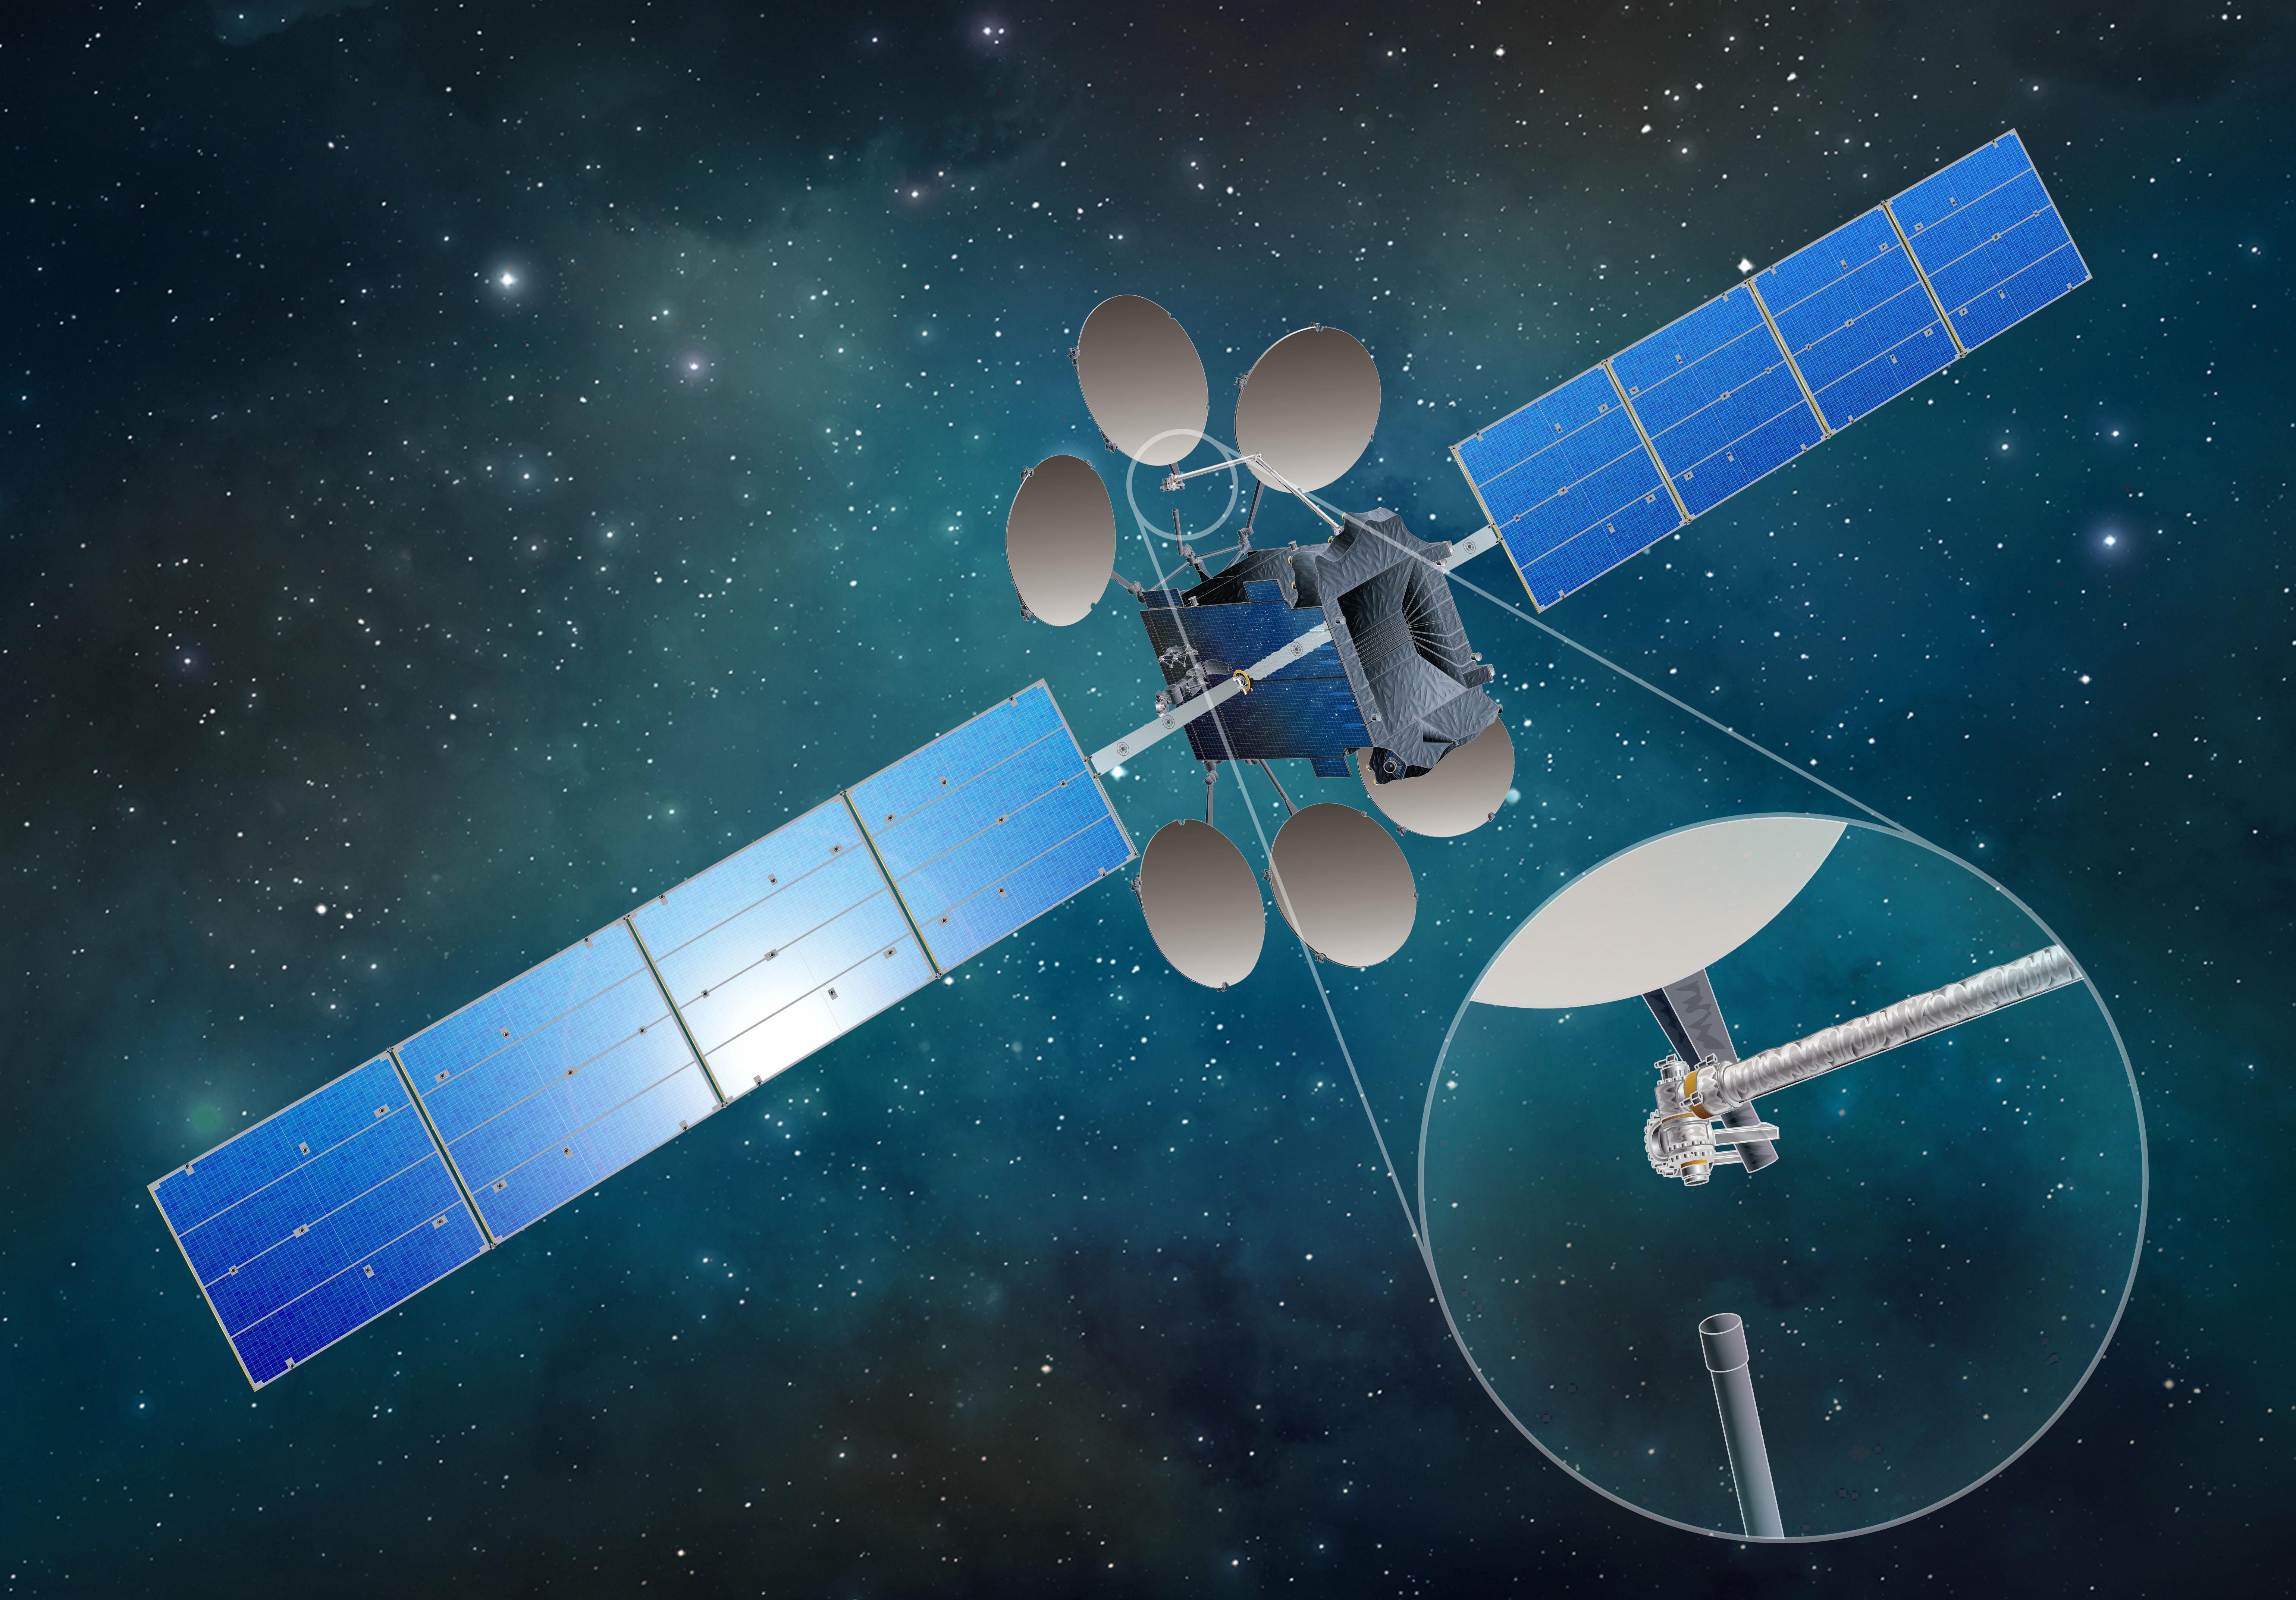 Nasa S Dragonfly Project Demonstrates Robotic Satellite Assembly Nasa